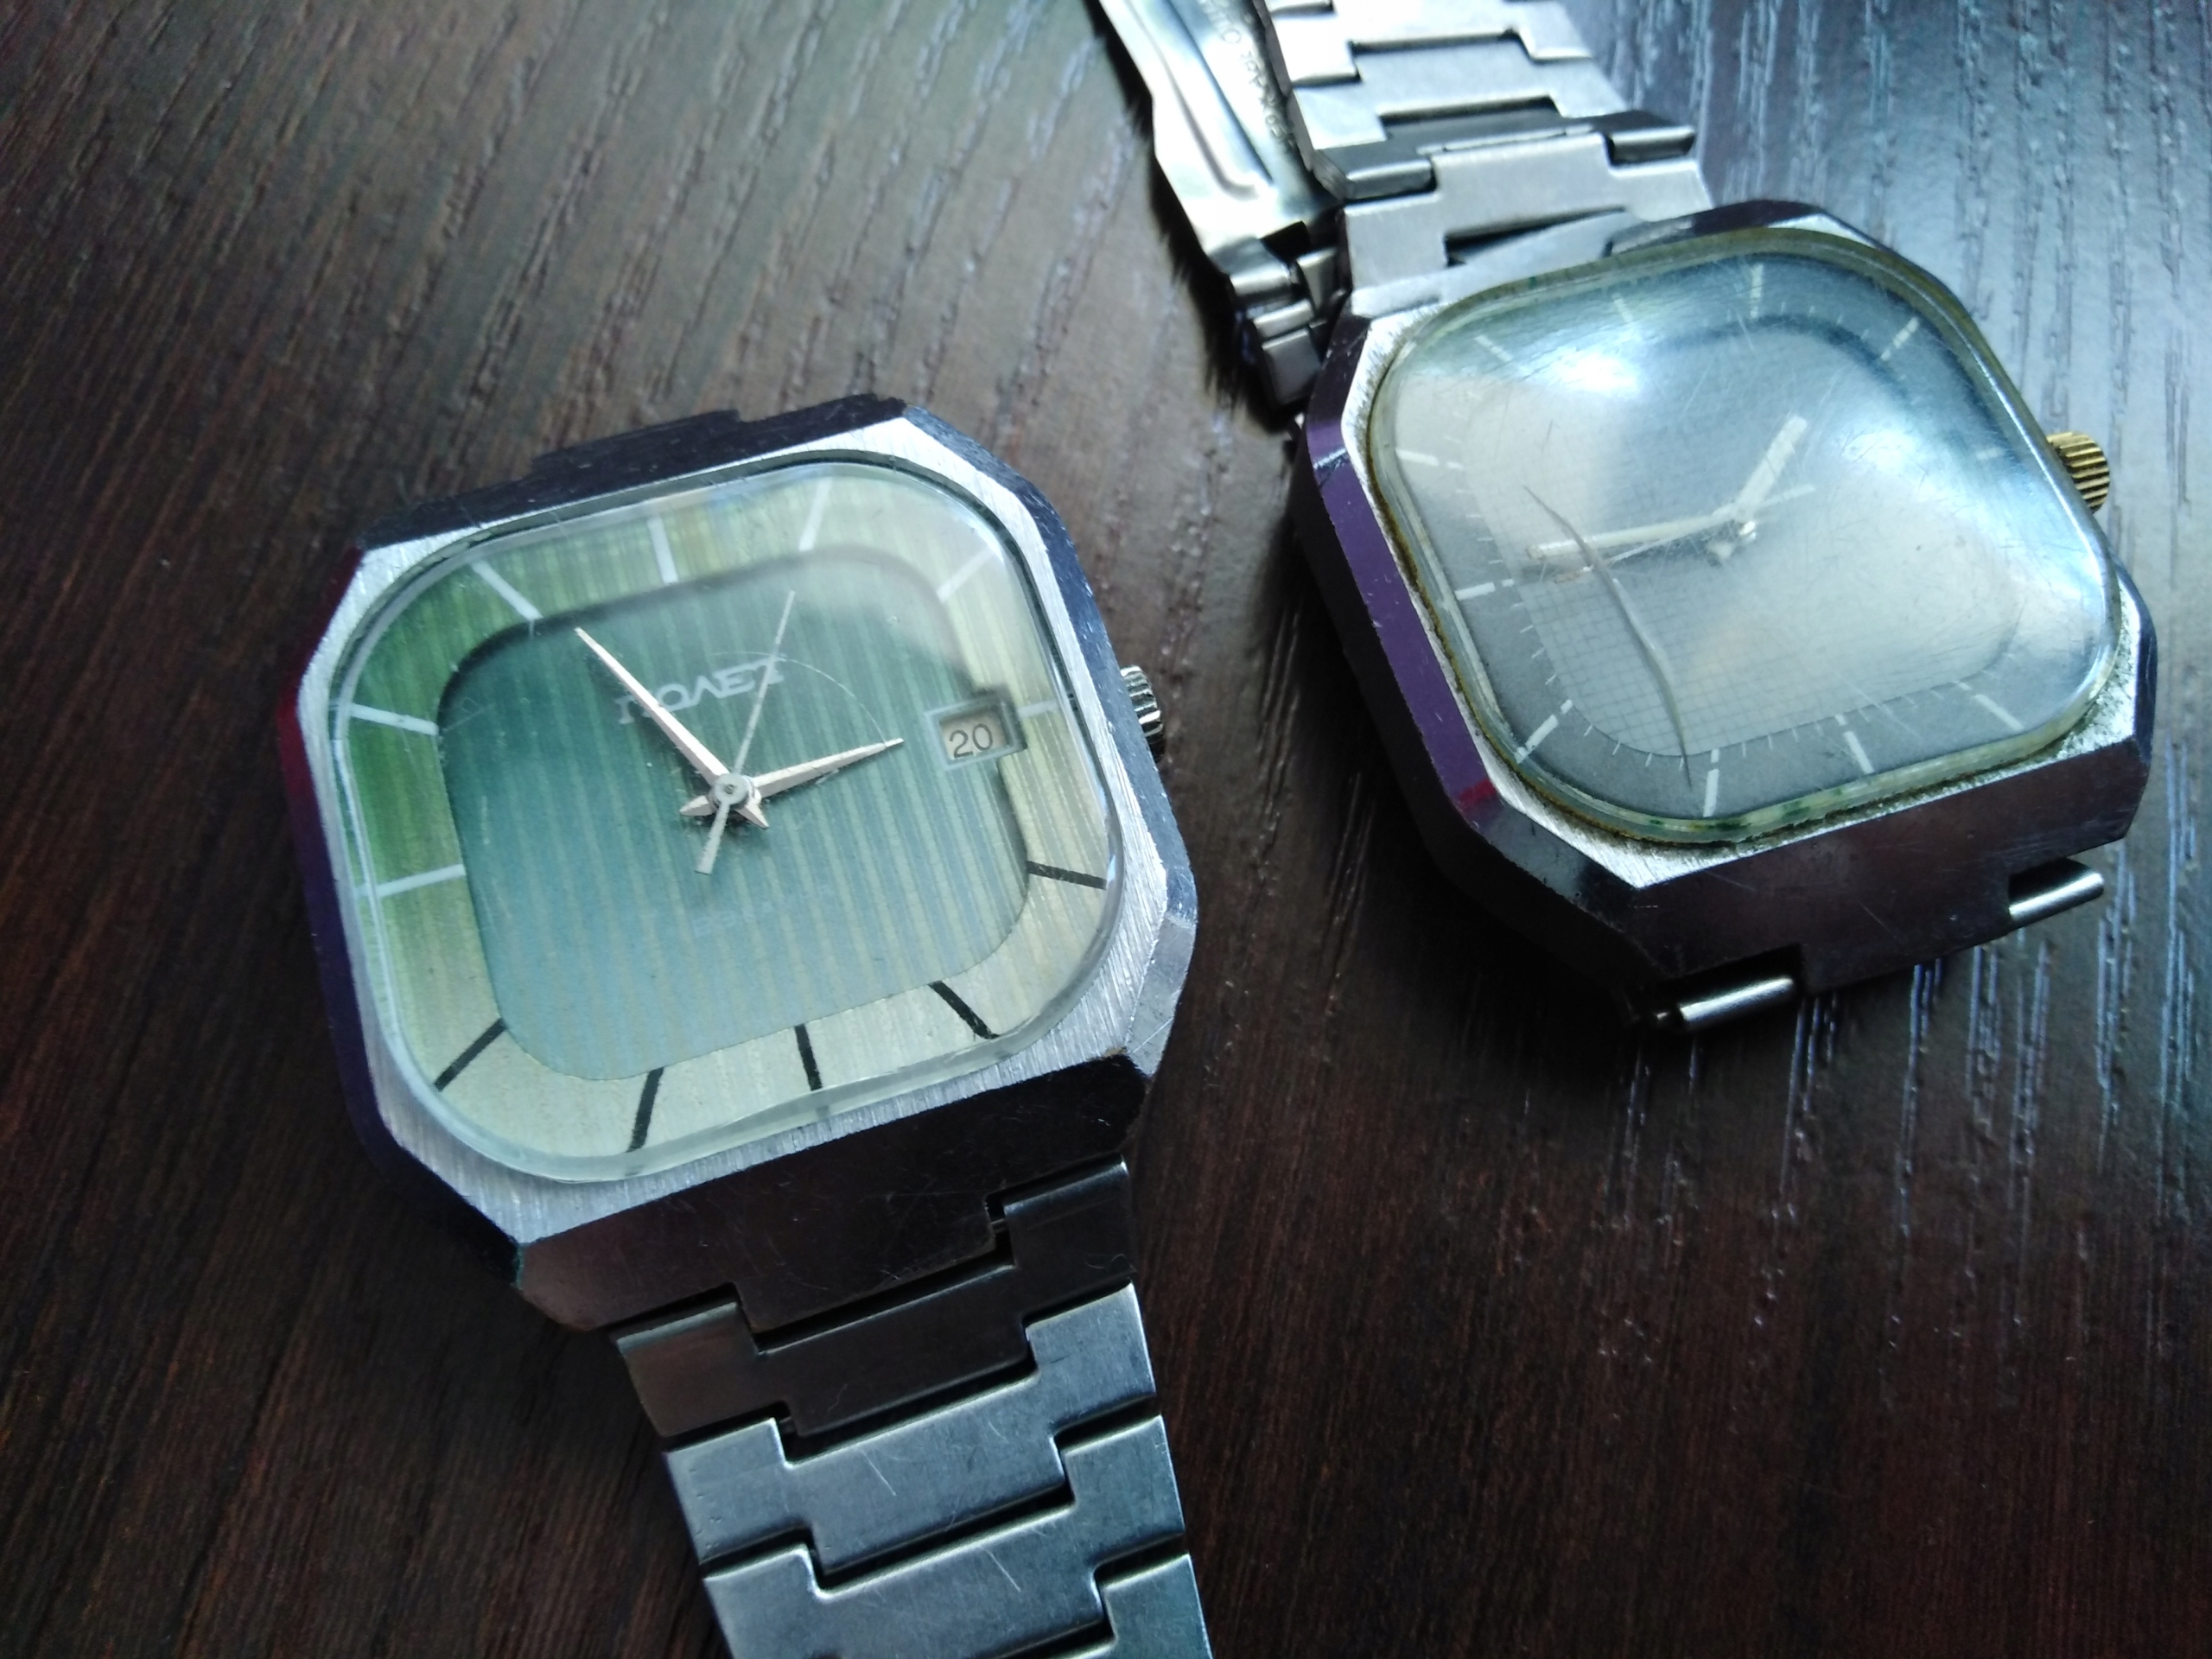 Zegarek Poljot Poliot automatyczny Vintage Soviet